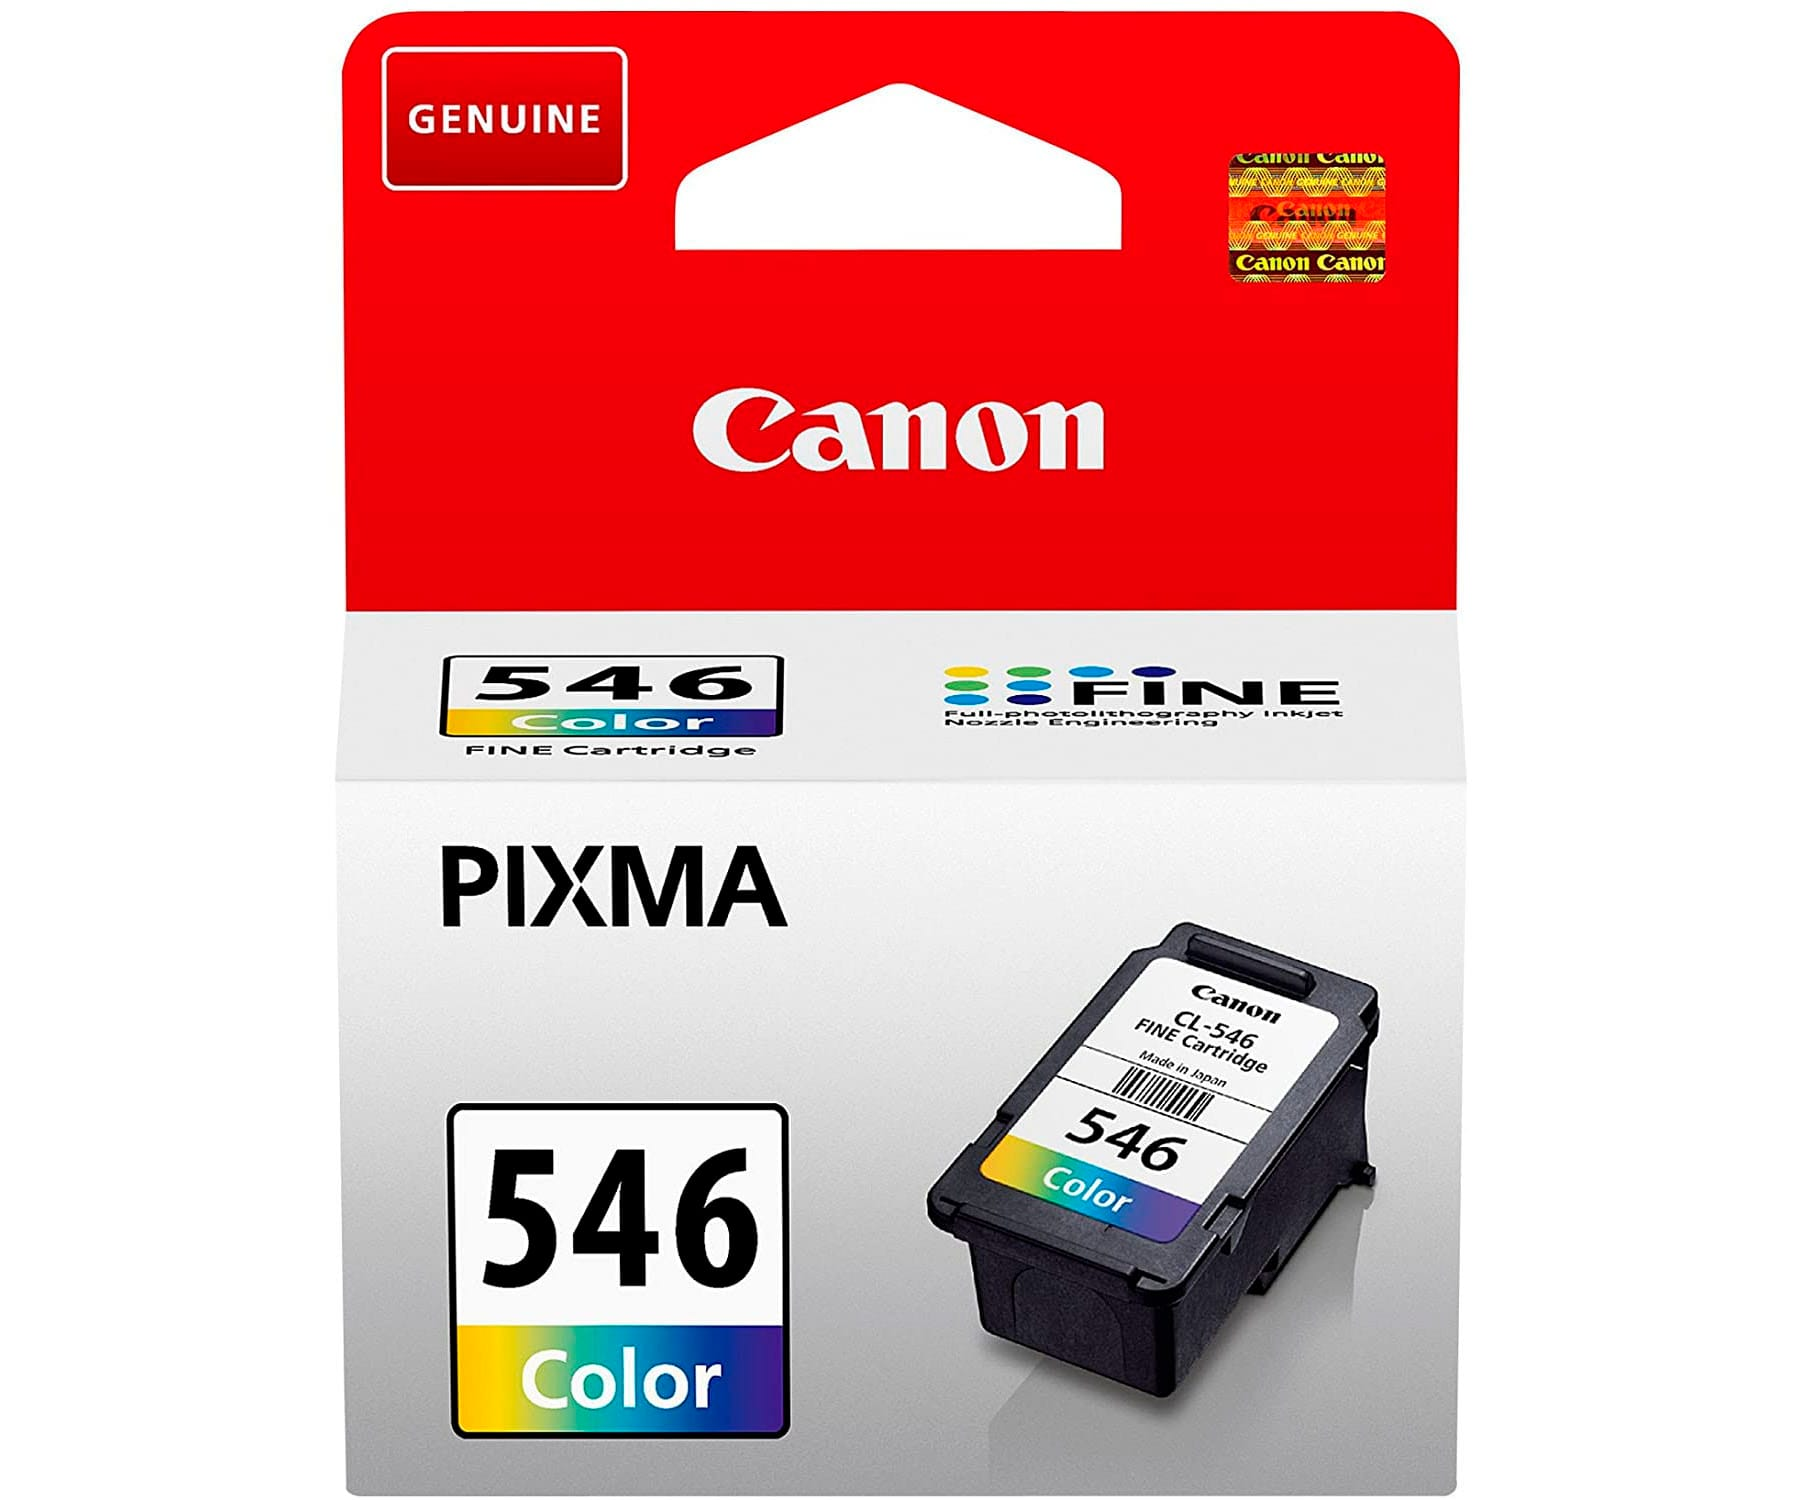 CANON CL-546 TRICOLOR CARTUCHO DE TINTA 8ML FINE PIXMA CIAN MAGENTA AMARILLO